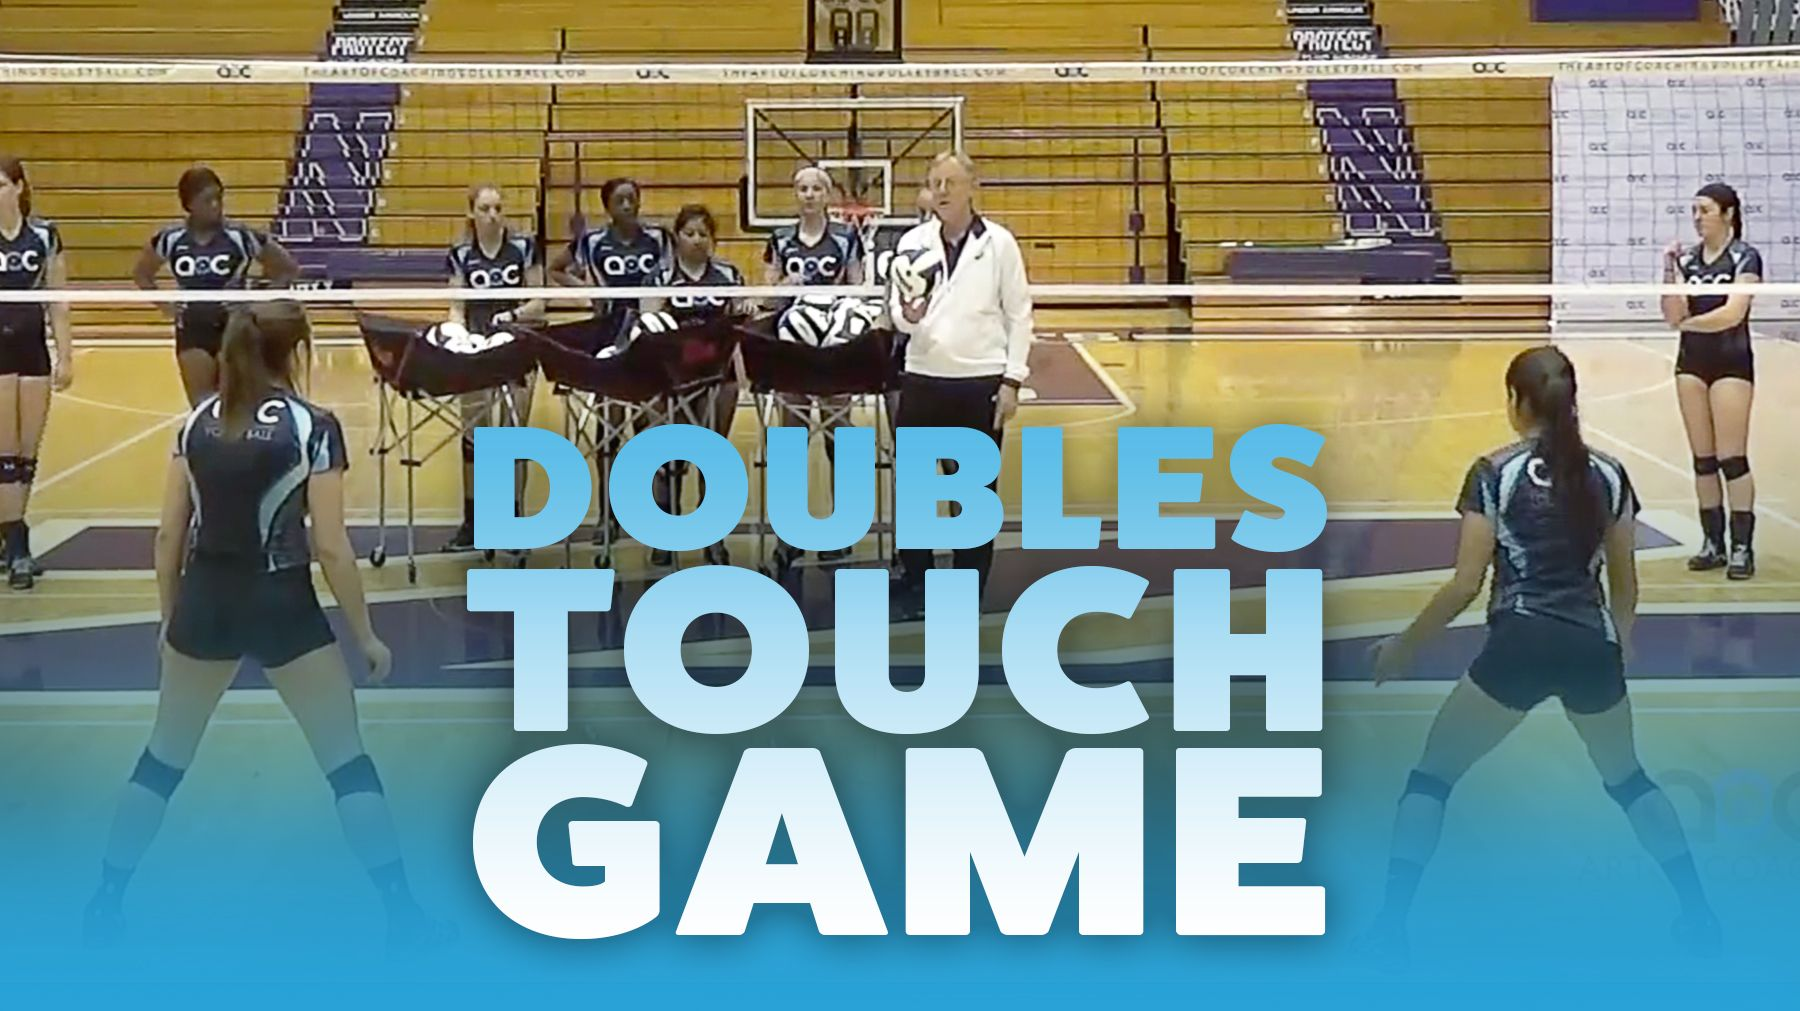 John Dunning Doubles Touch Game Coaching Volleyball Volleyball Workouts Volleyball Conditioning